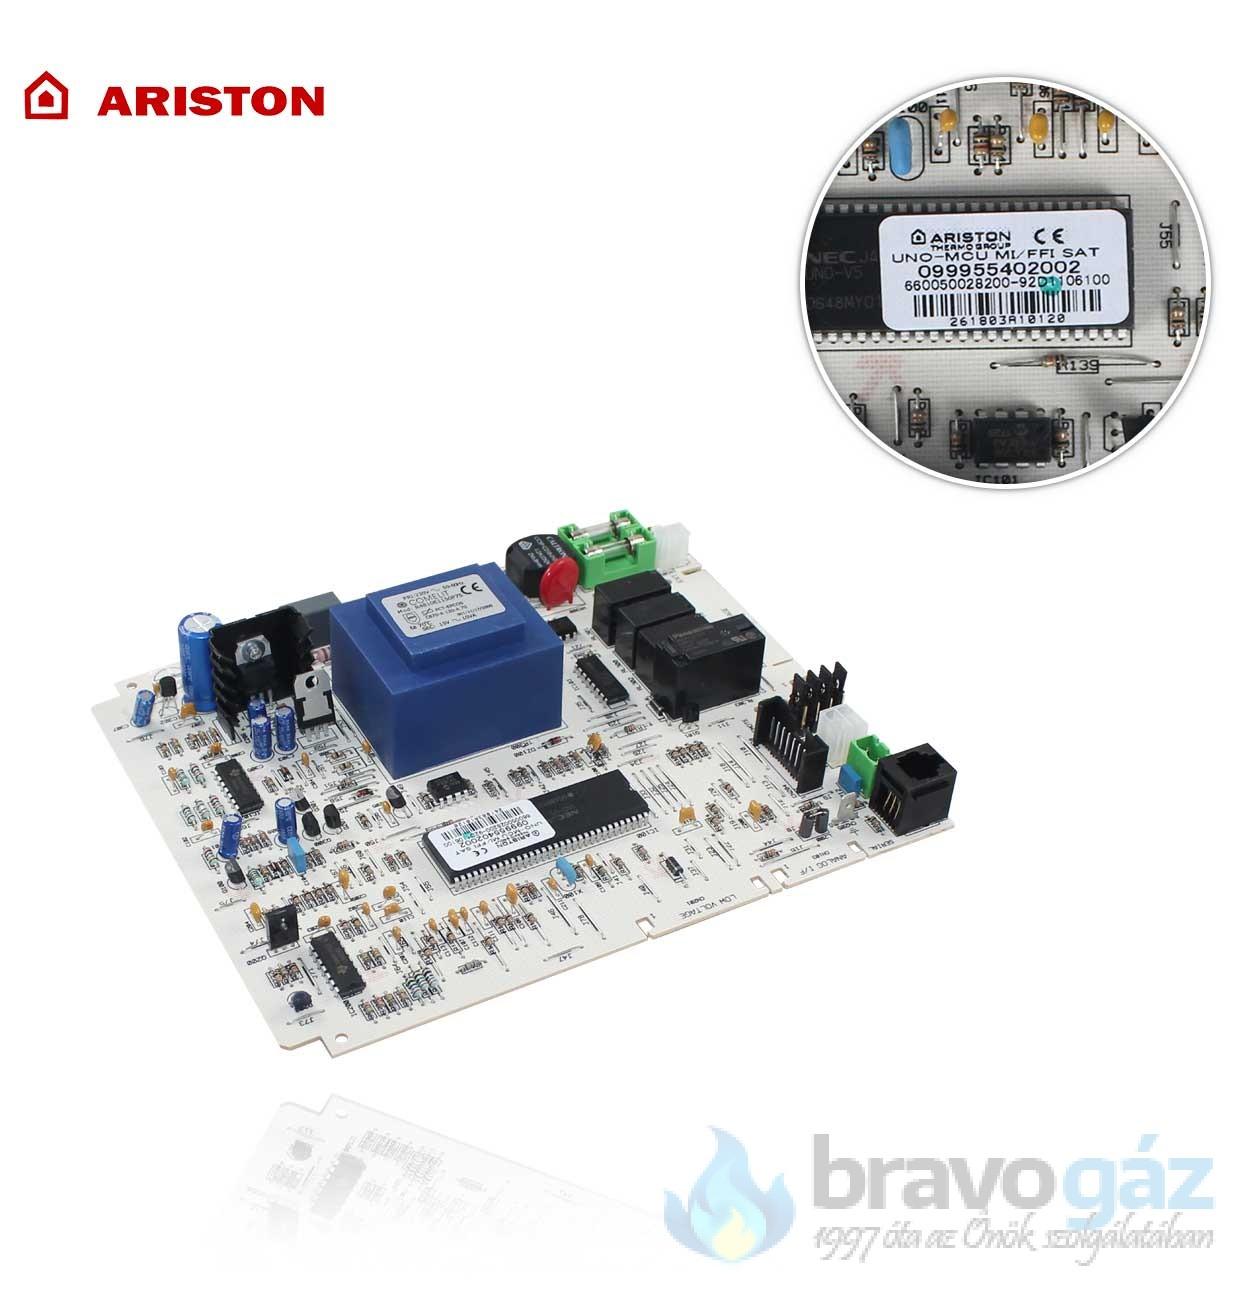 Ariston vezérlő panel - 65100729